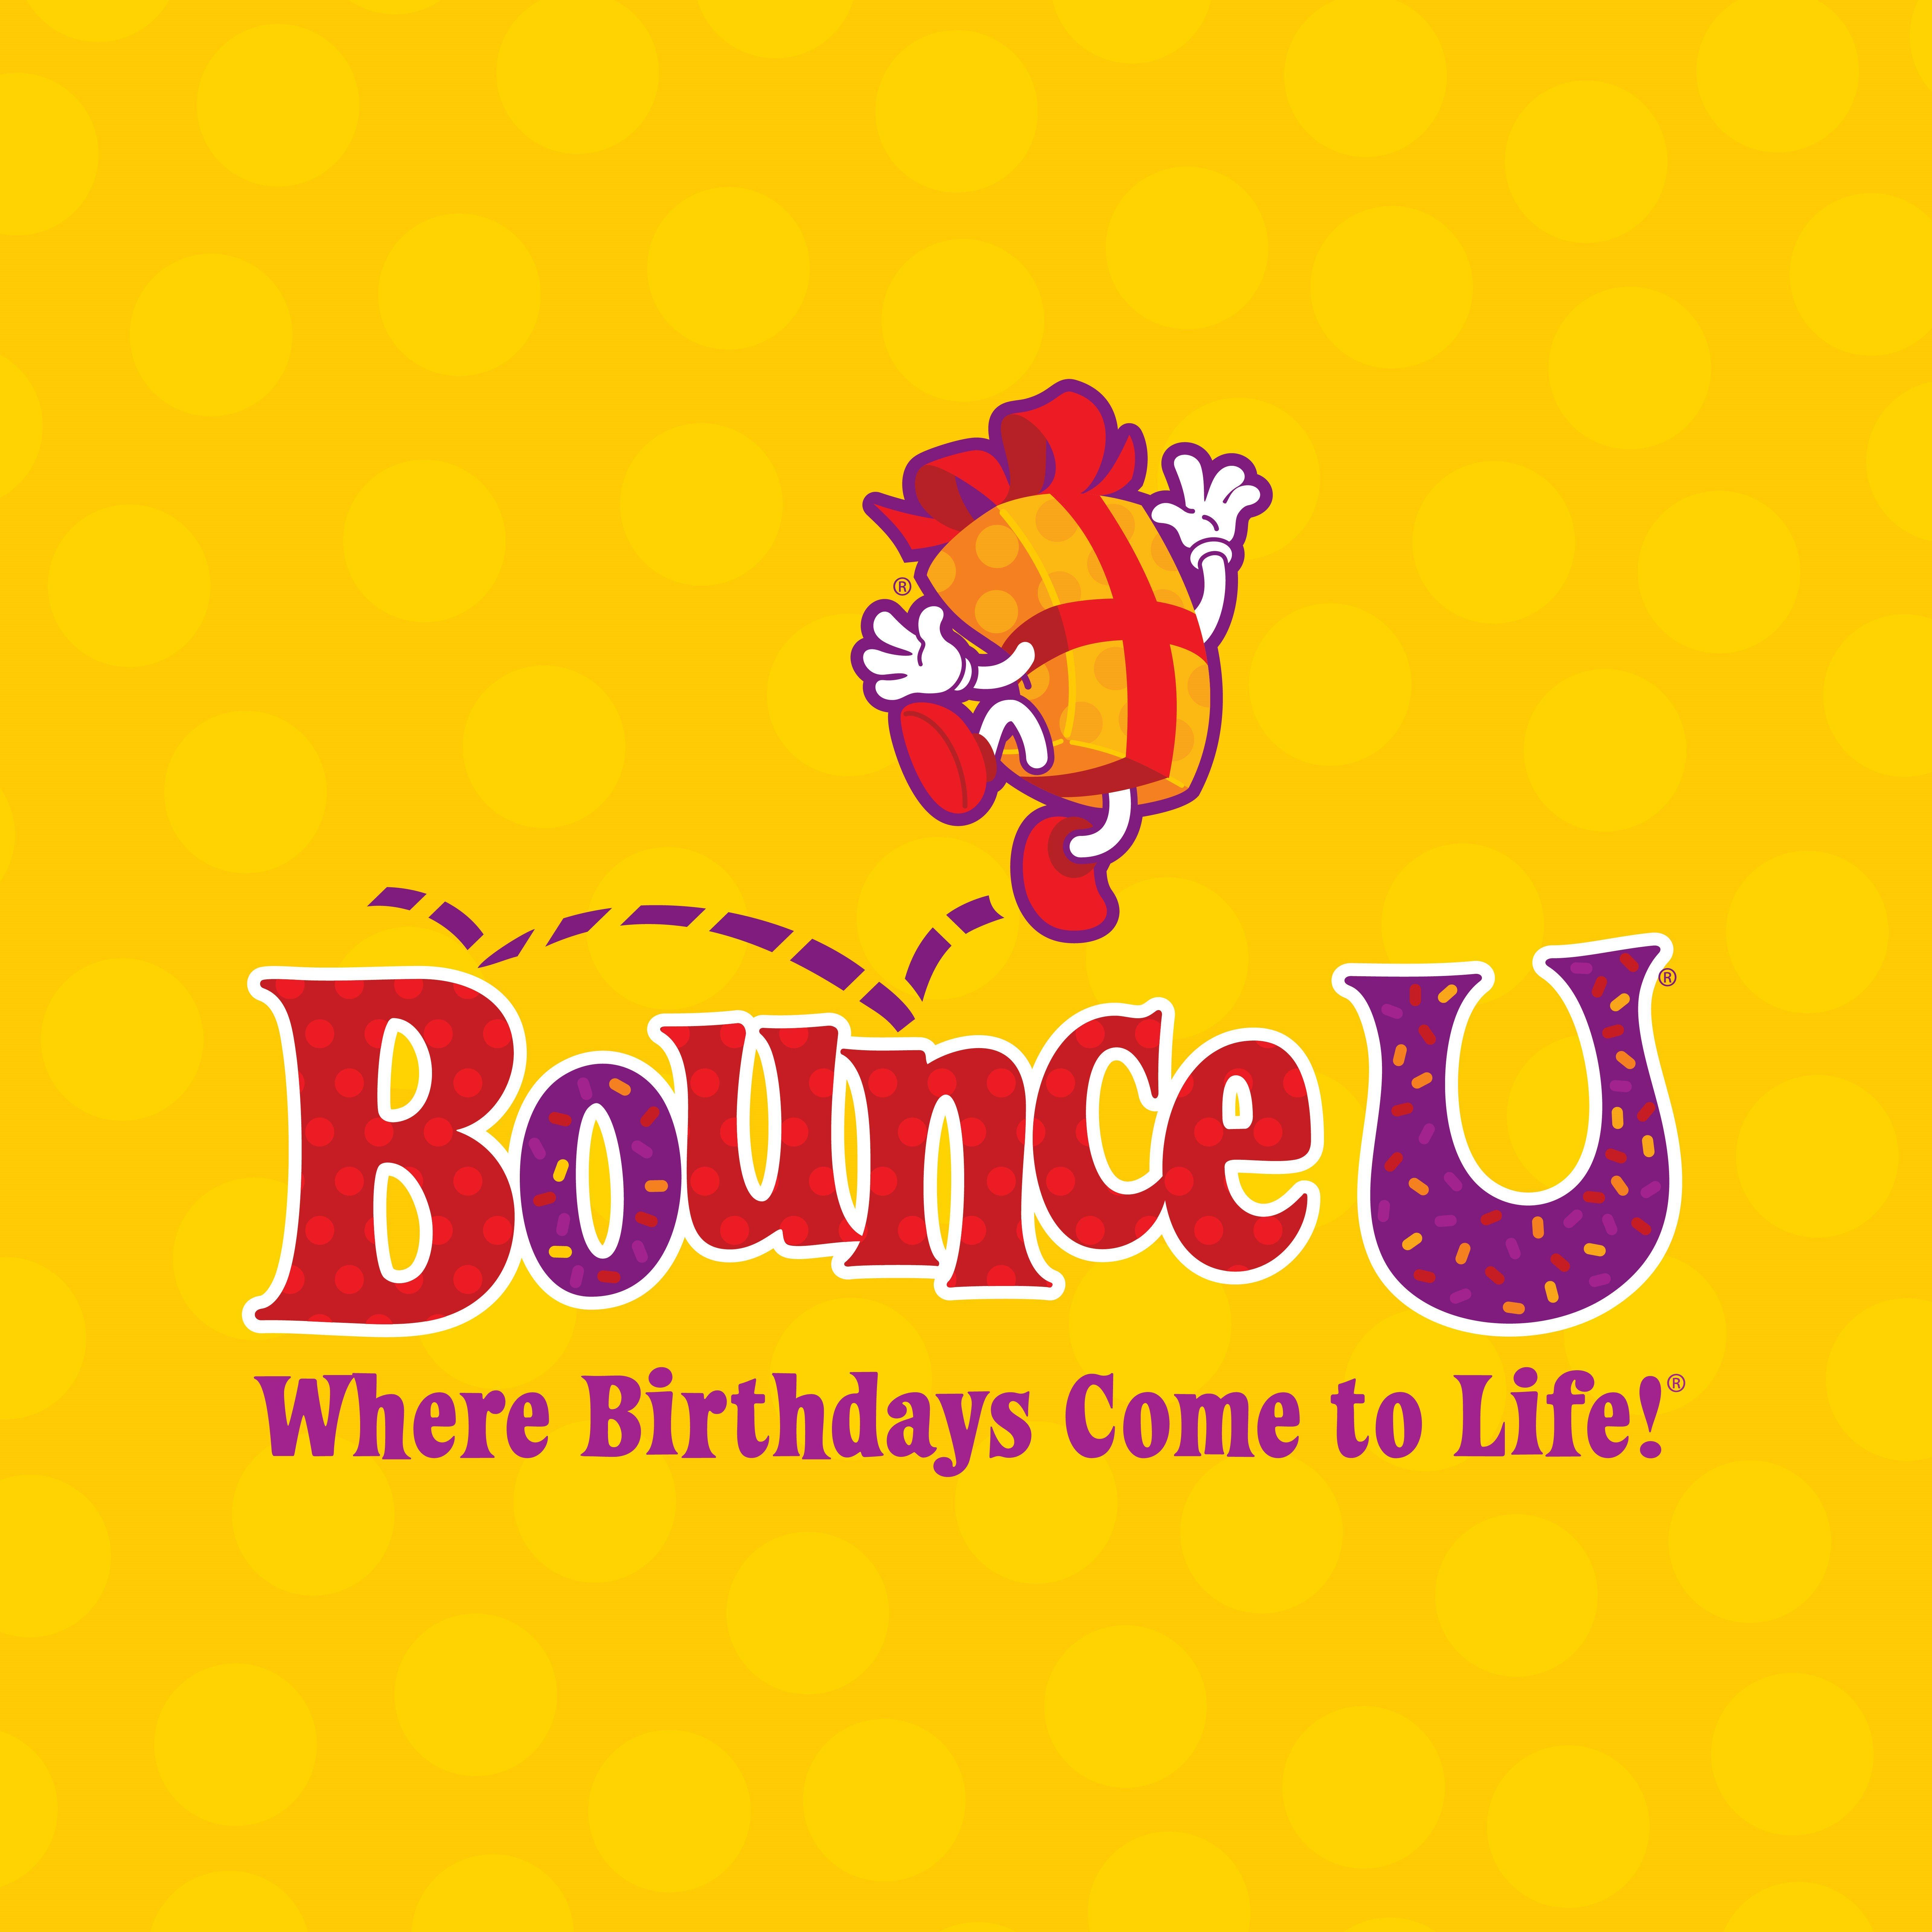 BounceU of Huntington Beach